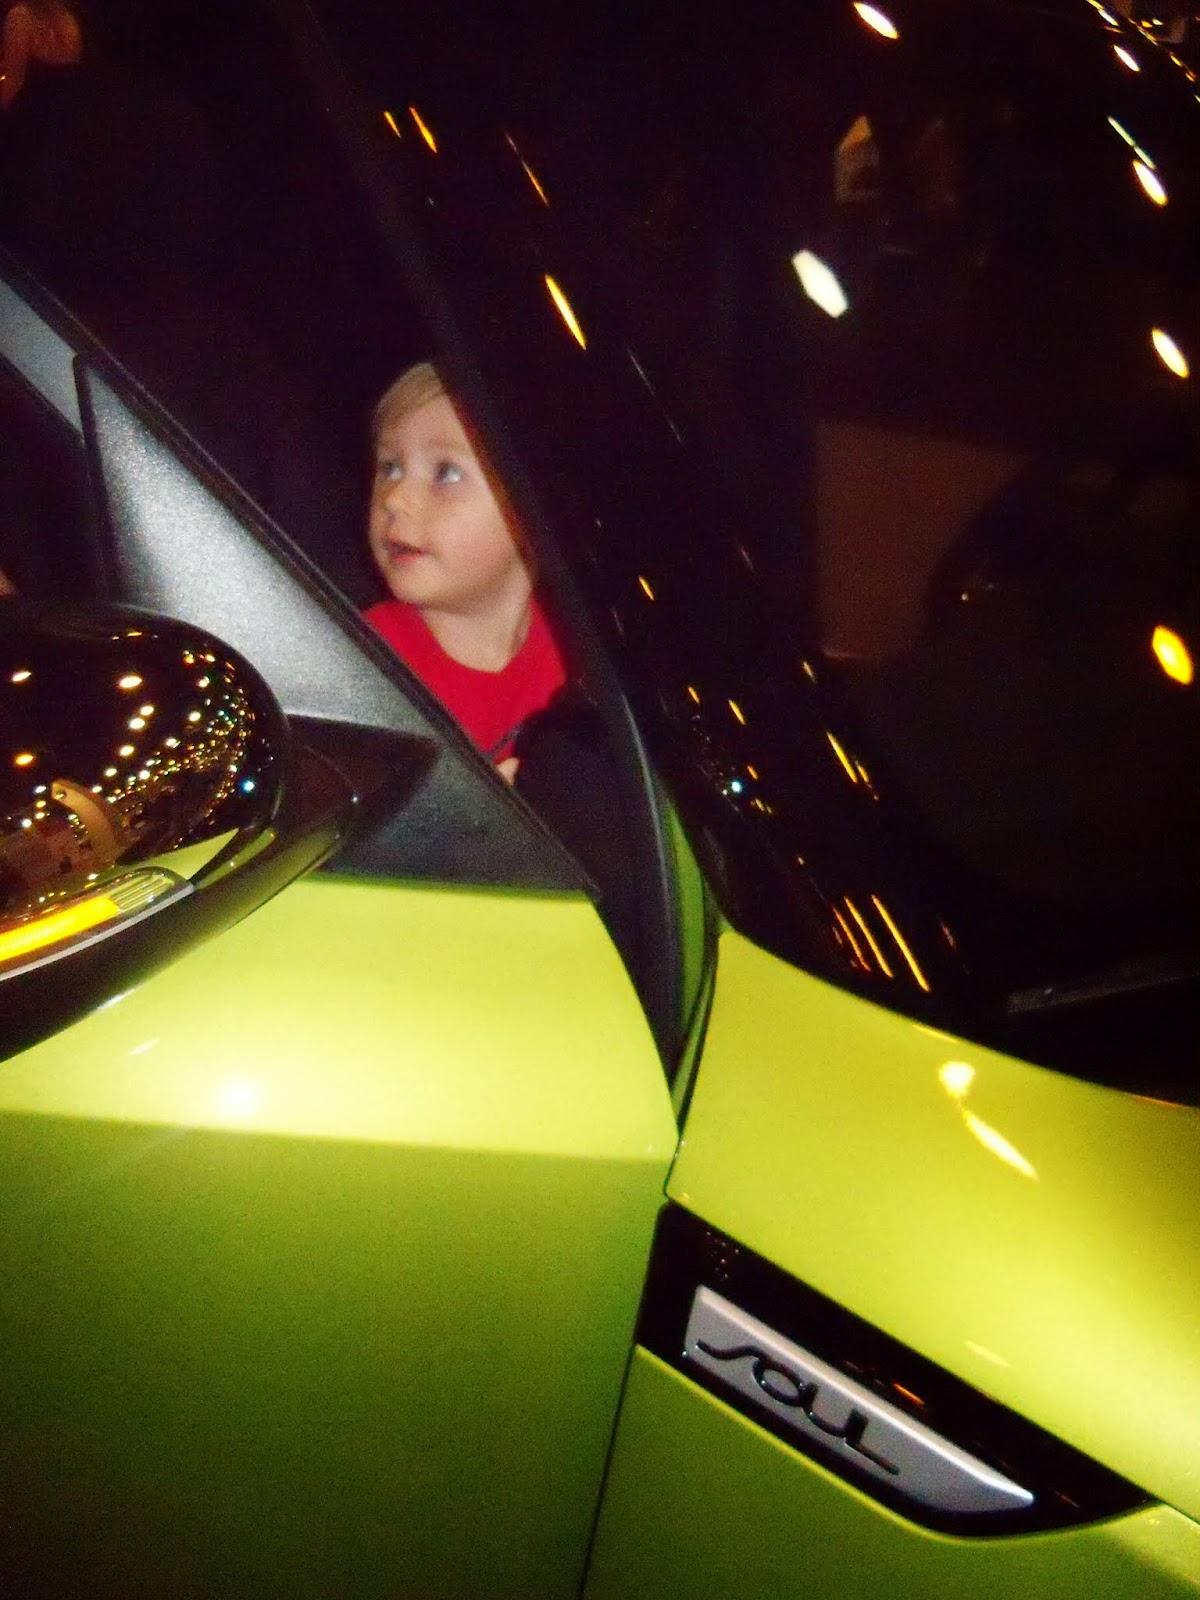 Houston Auto Show 2015 - 116_7345.JPG